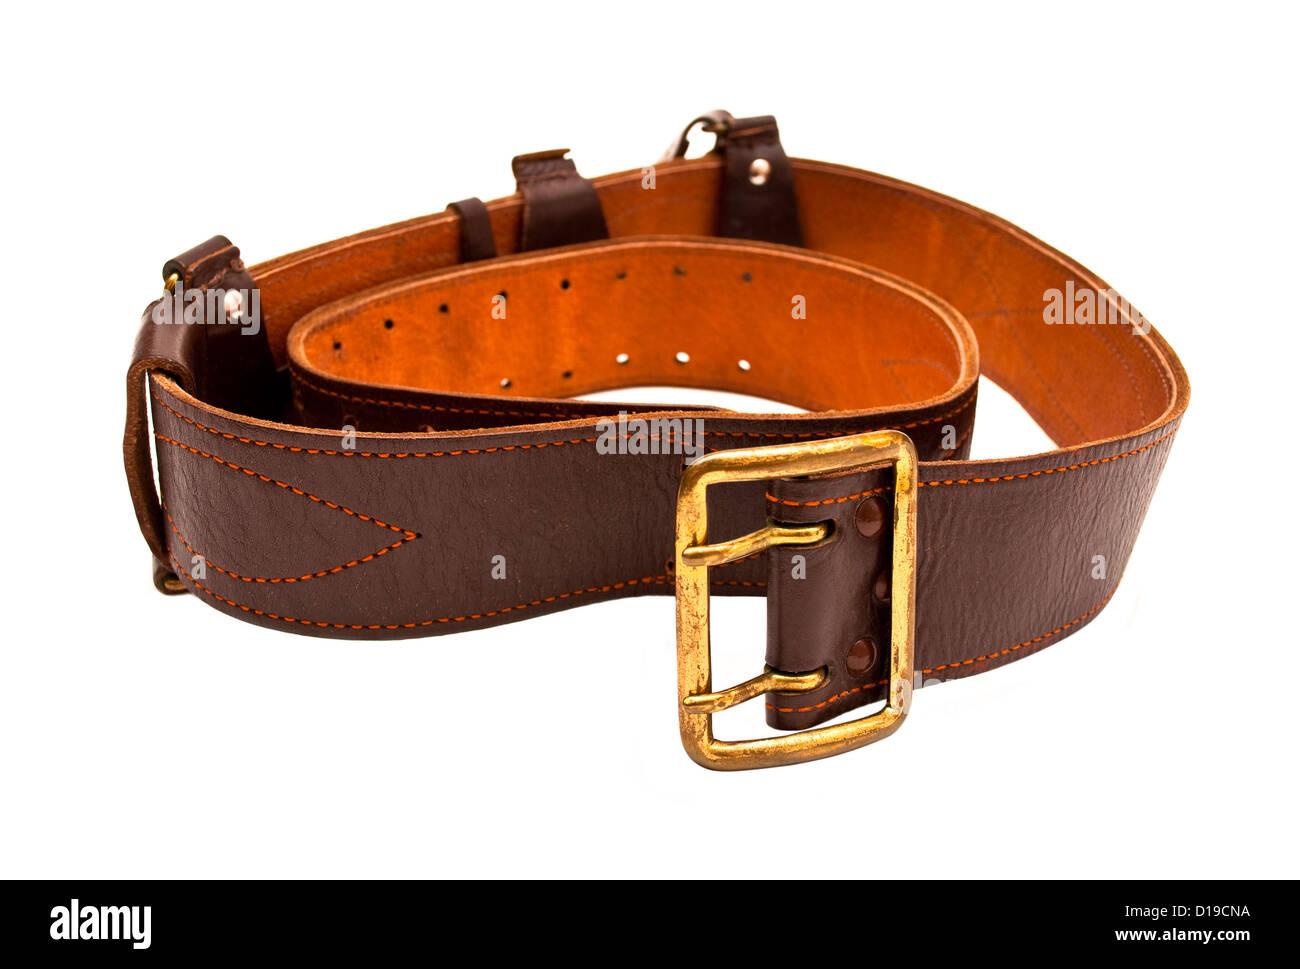 belt isolated on a white background - Stock Image